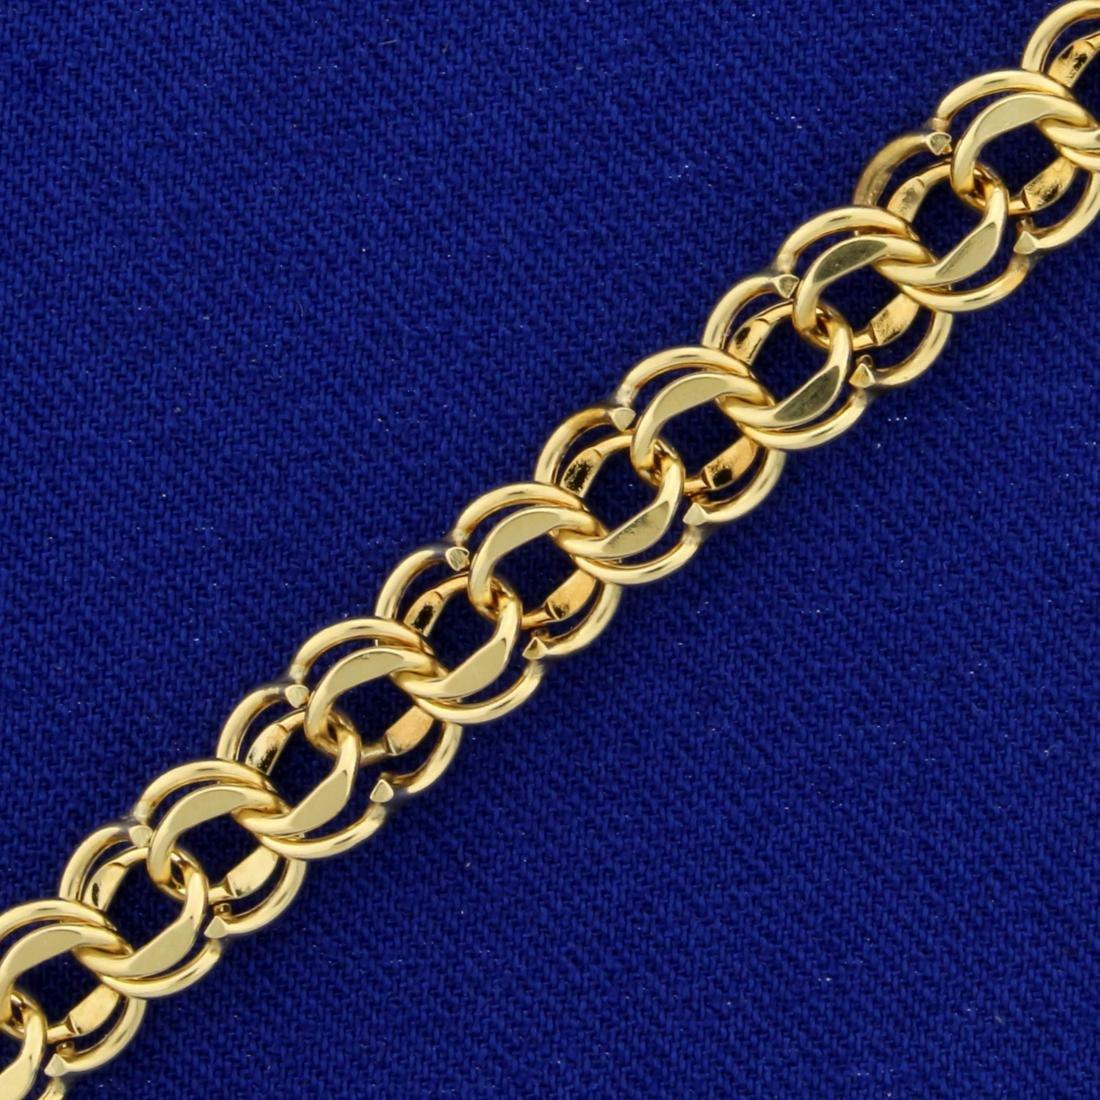 7 1/4 Inch Charm Bracelet in 14K Yellow Gold - 2